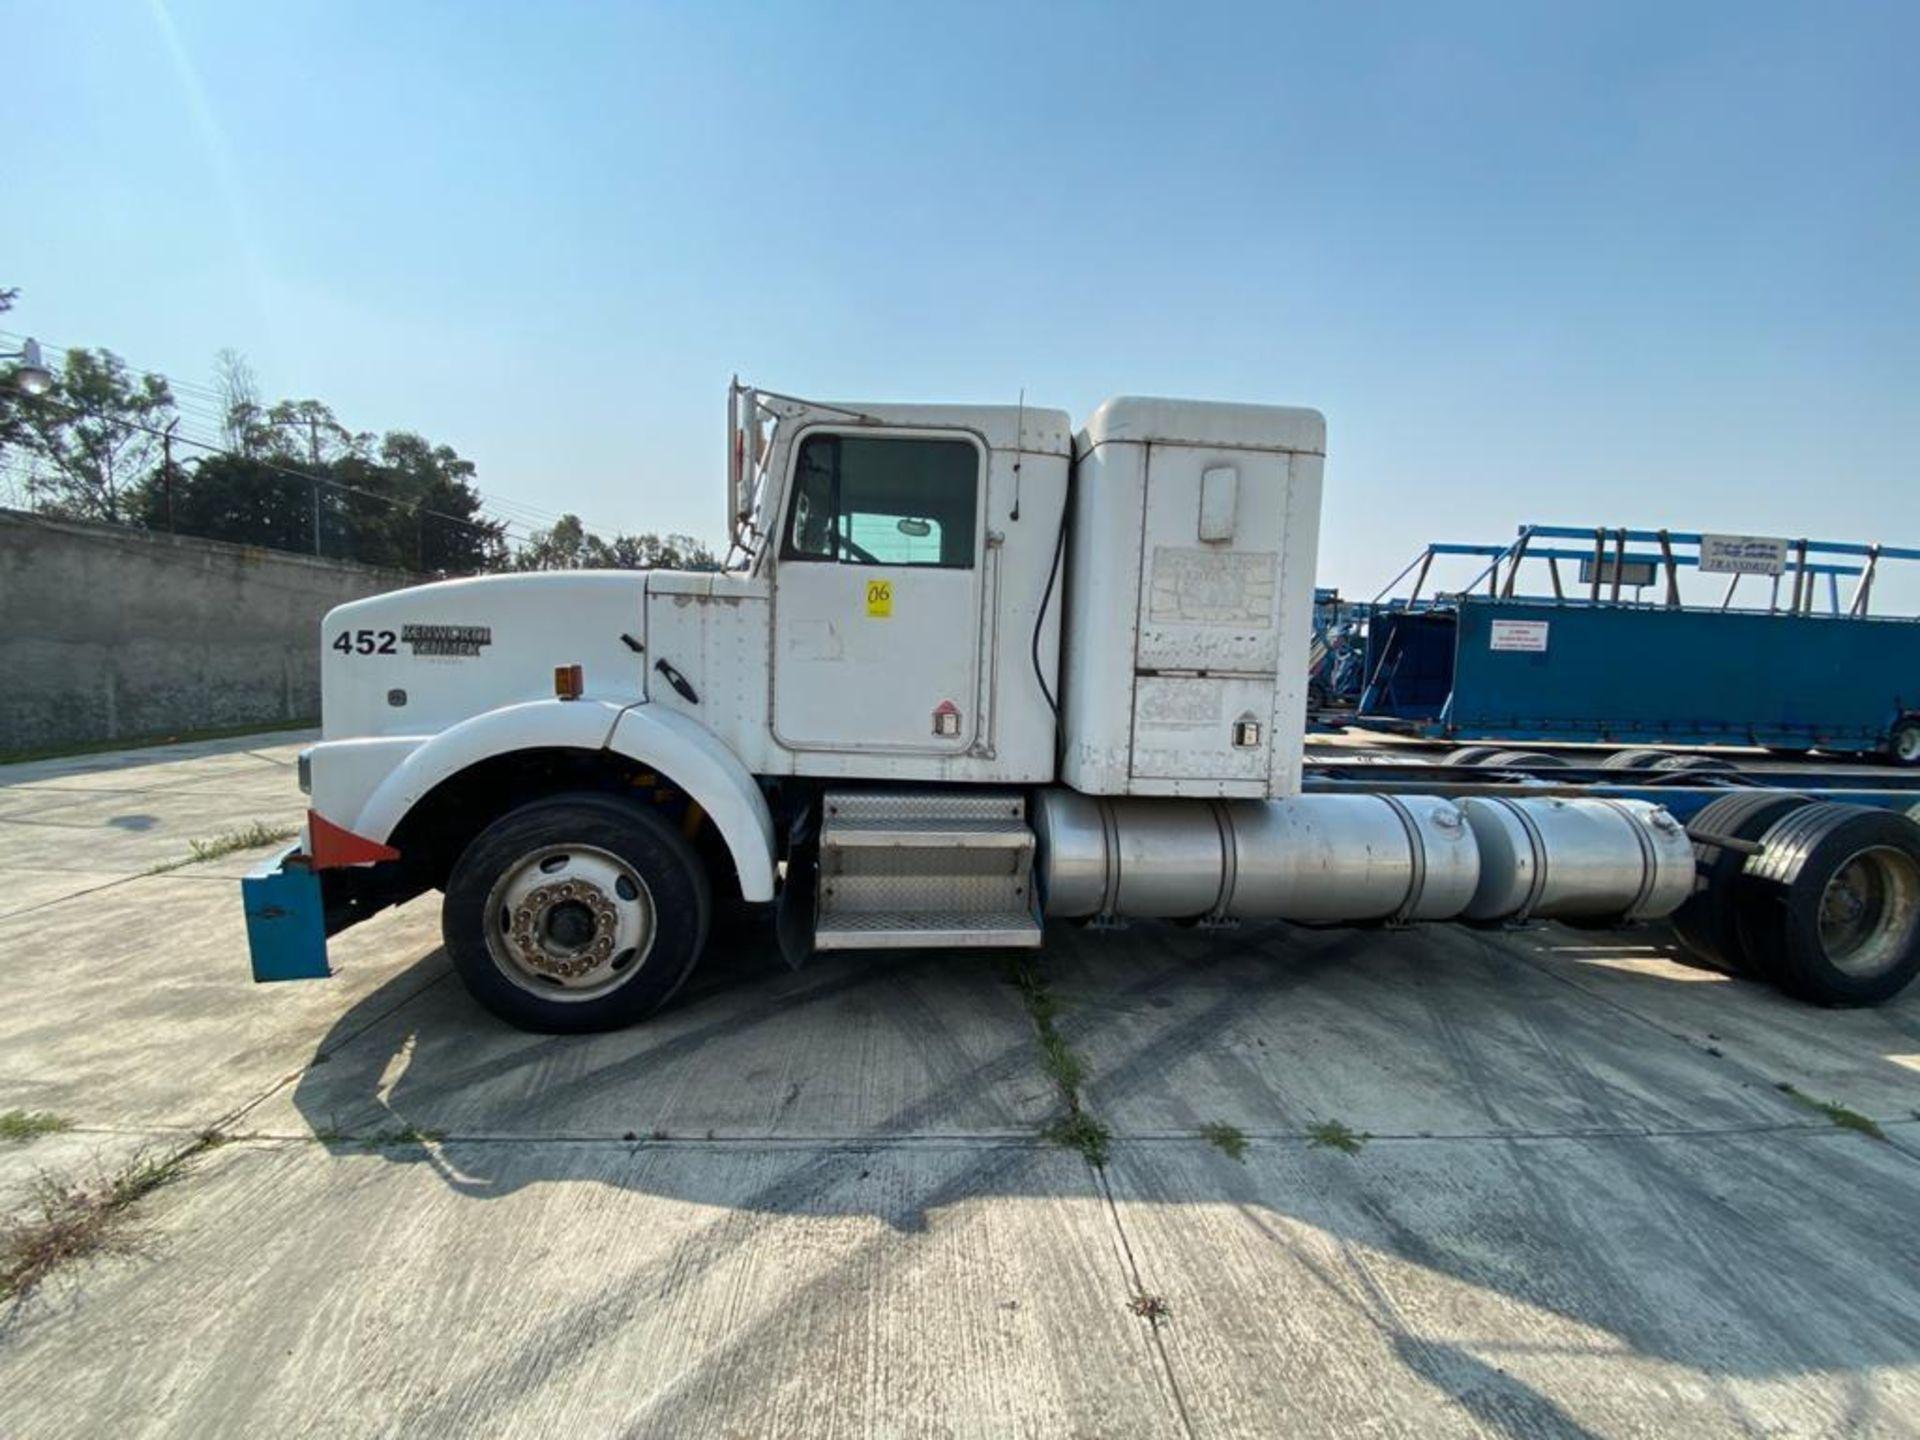 1998 Kenworth Sleeper truck tractor, standard transmission of 18 speeds - Image 9 of 75